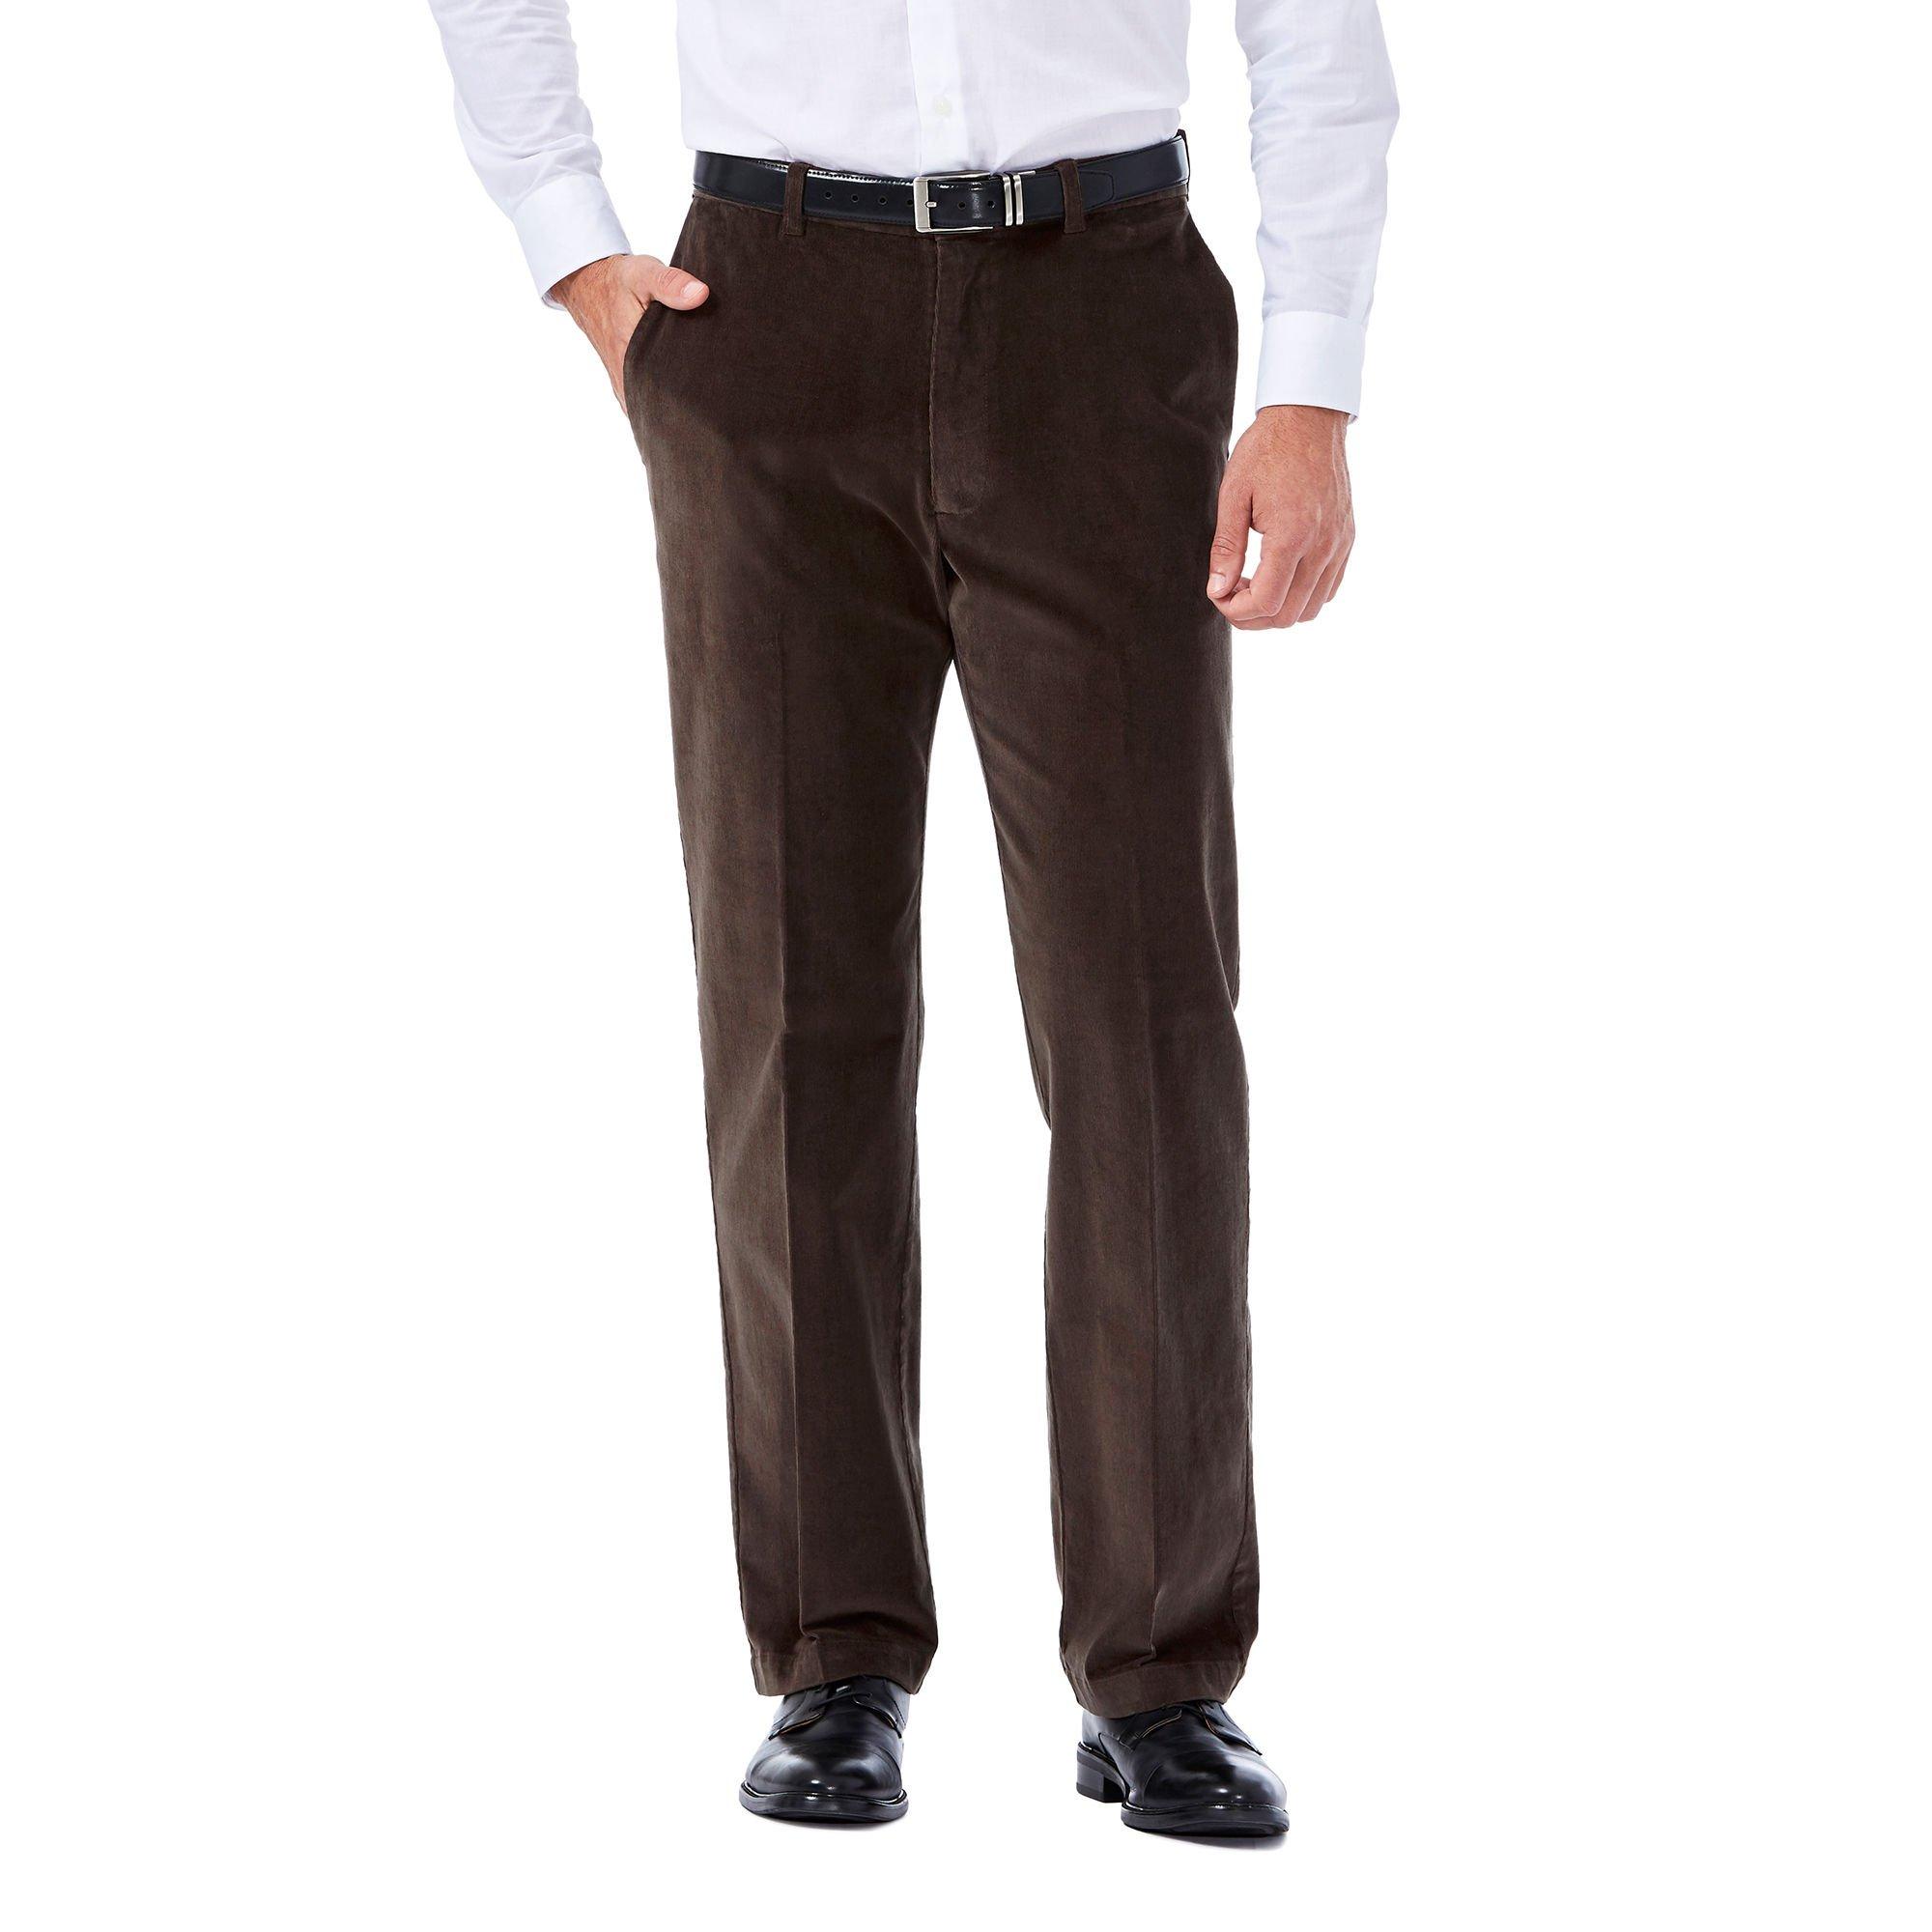 Haggar Mens 21 Wale Stretch Corduroy Expandable Waist Classic Fit Plain Front Pant